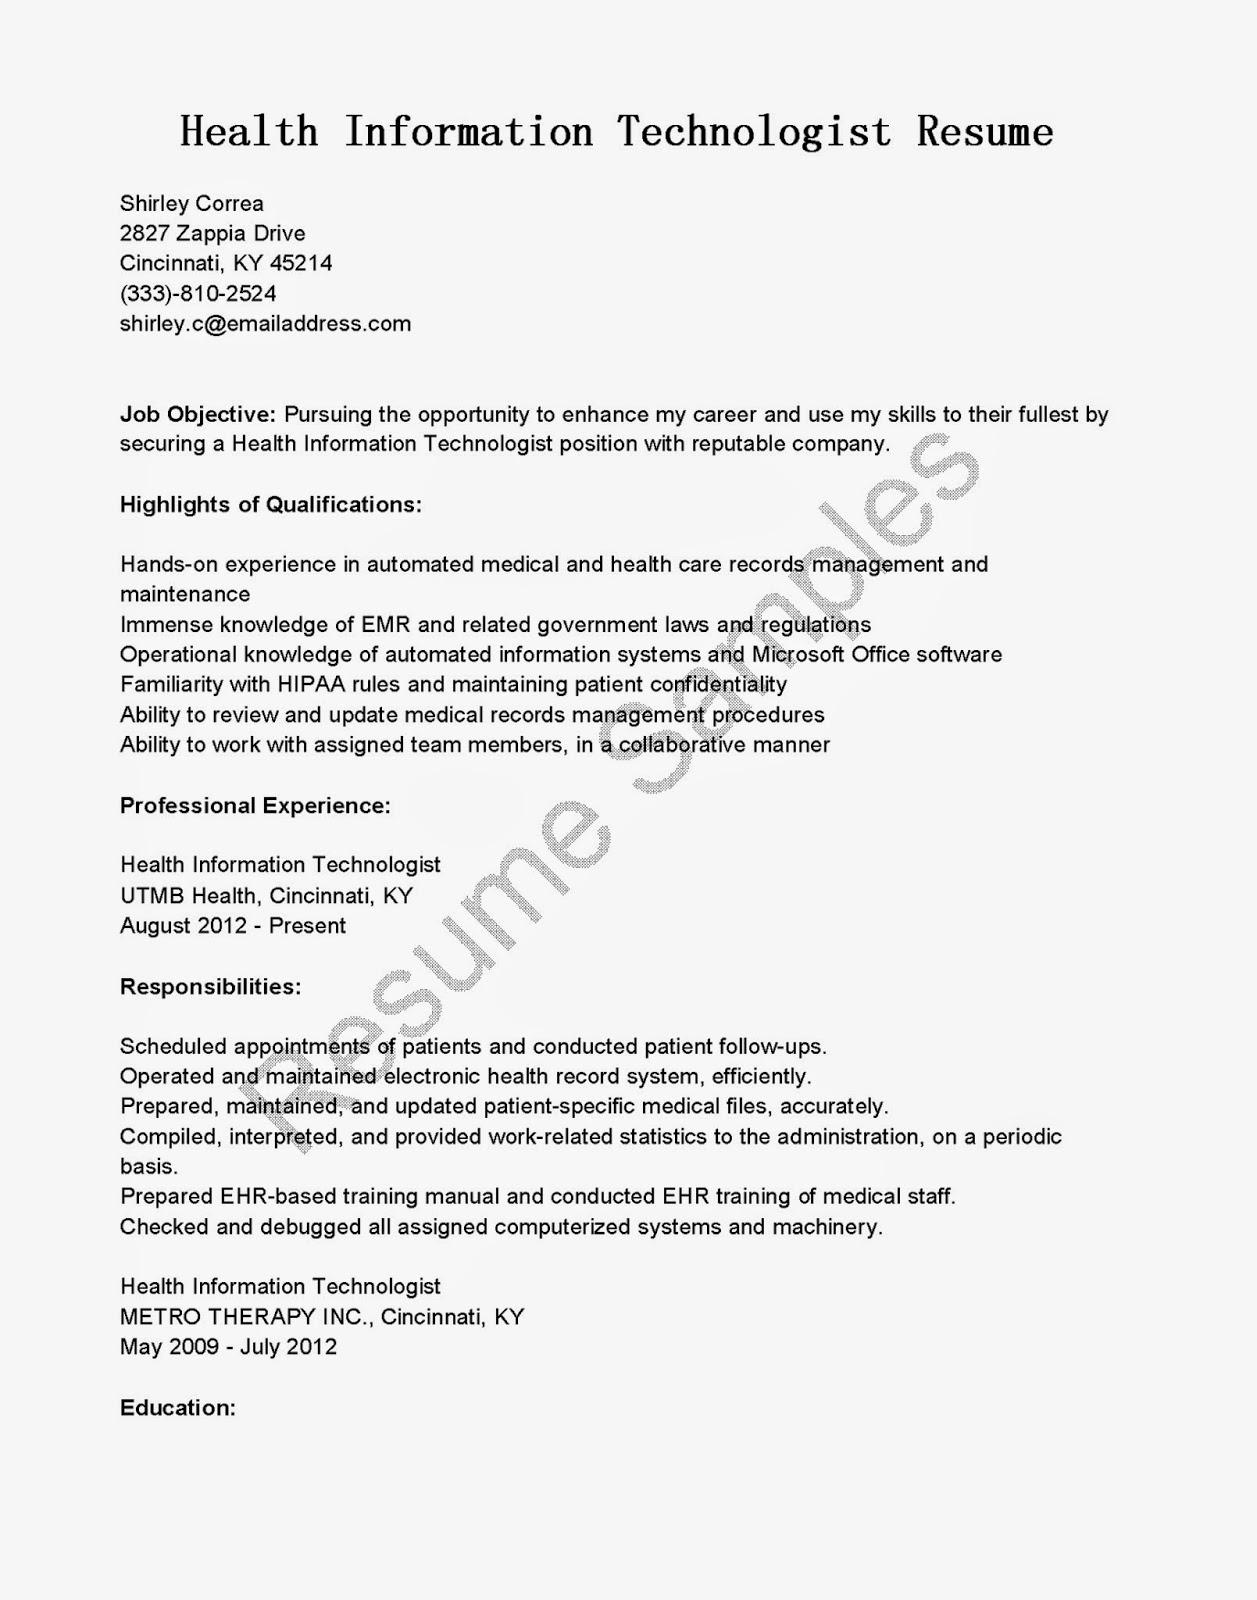 Resume Samples Health Information Technologist Resume Sample